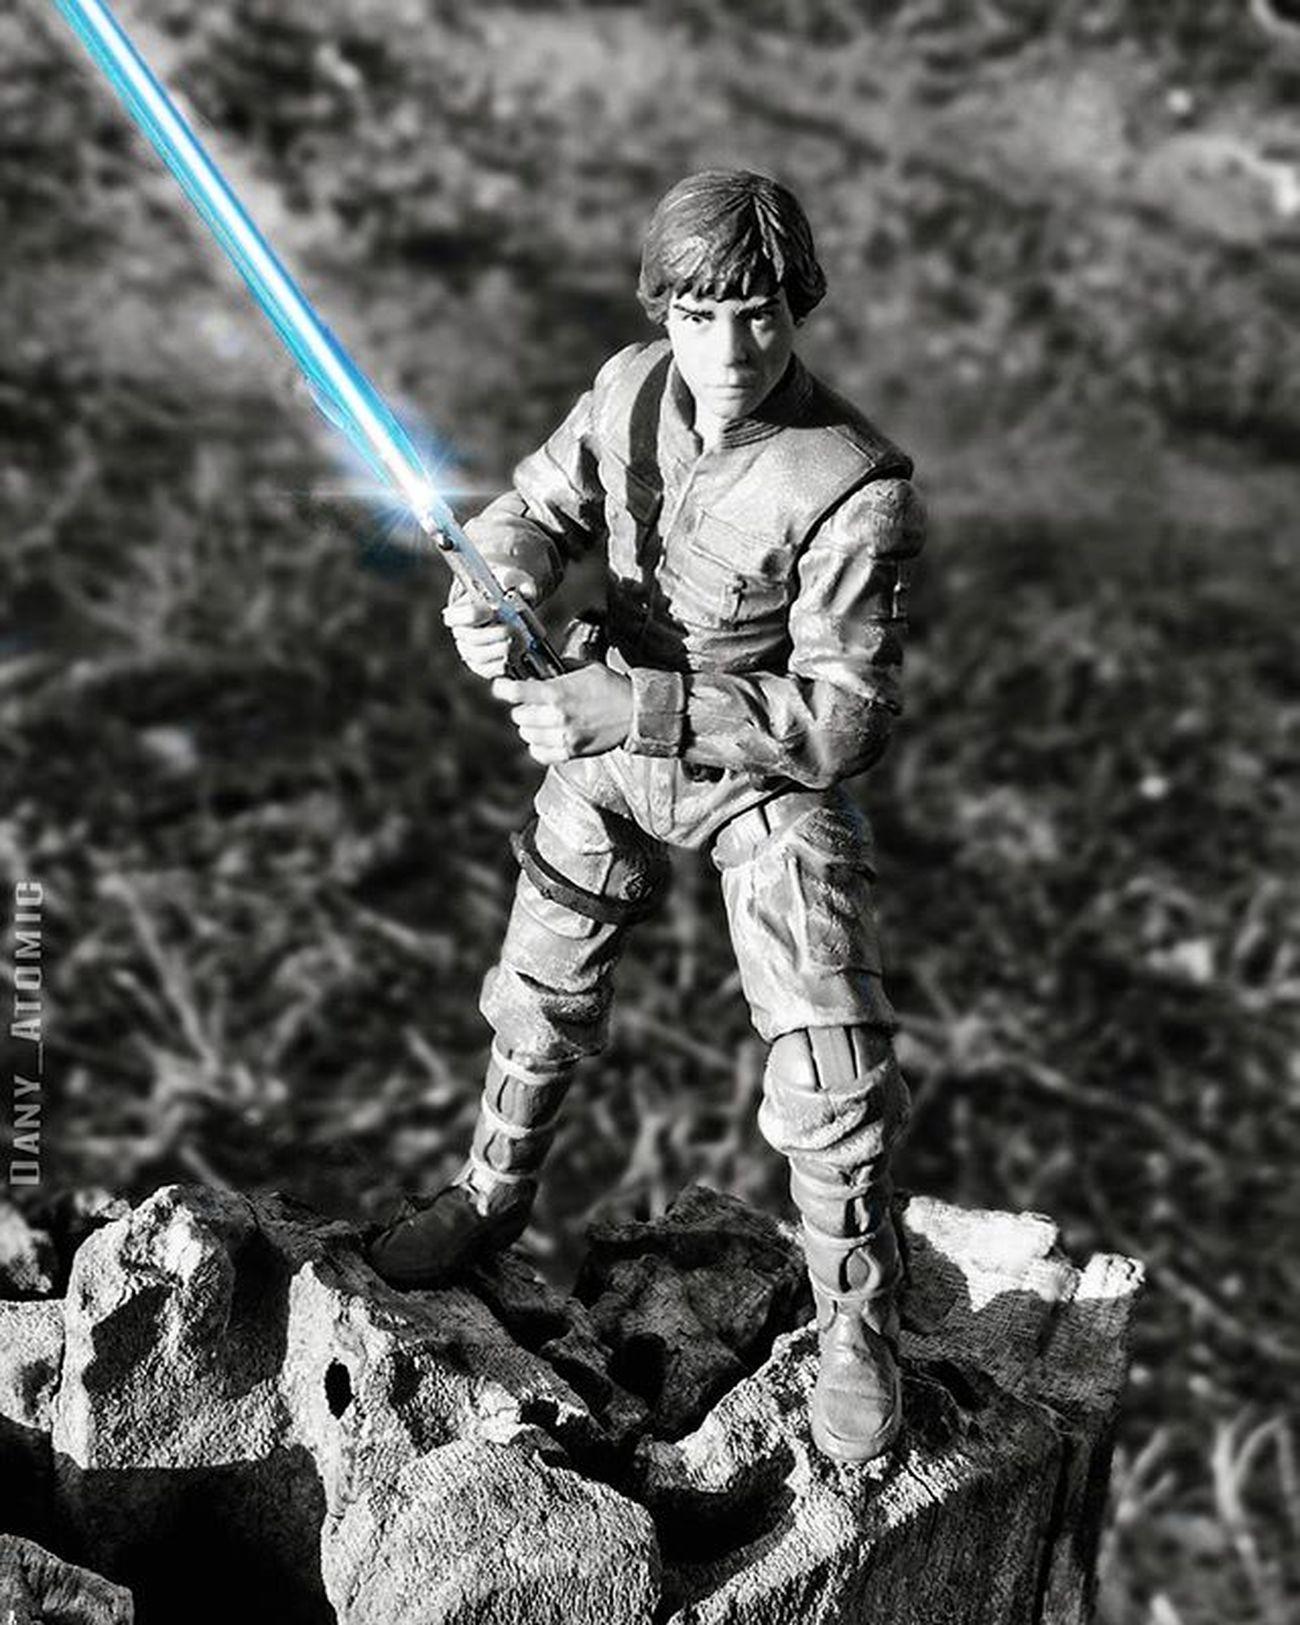 Colorsplash Lukeskywalker BespinLuke Lightsaber Jedi Starwars StarWarsTheVintageCollection Starwarsdaily TheSkywalkerlegacy Colorsplash Blackandwhite